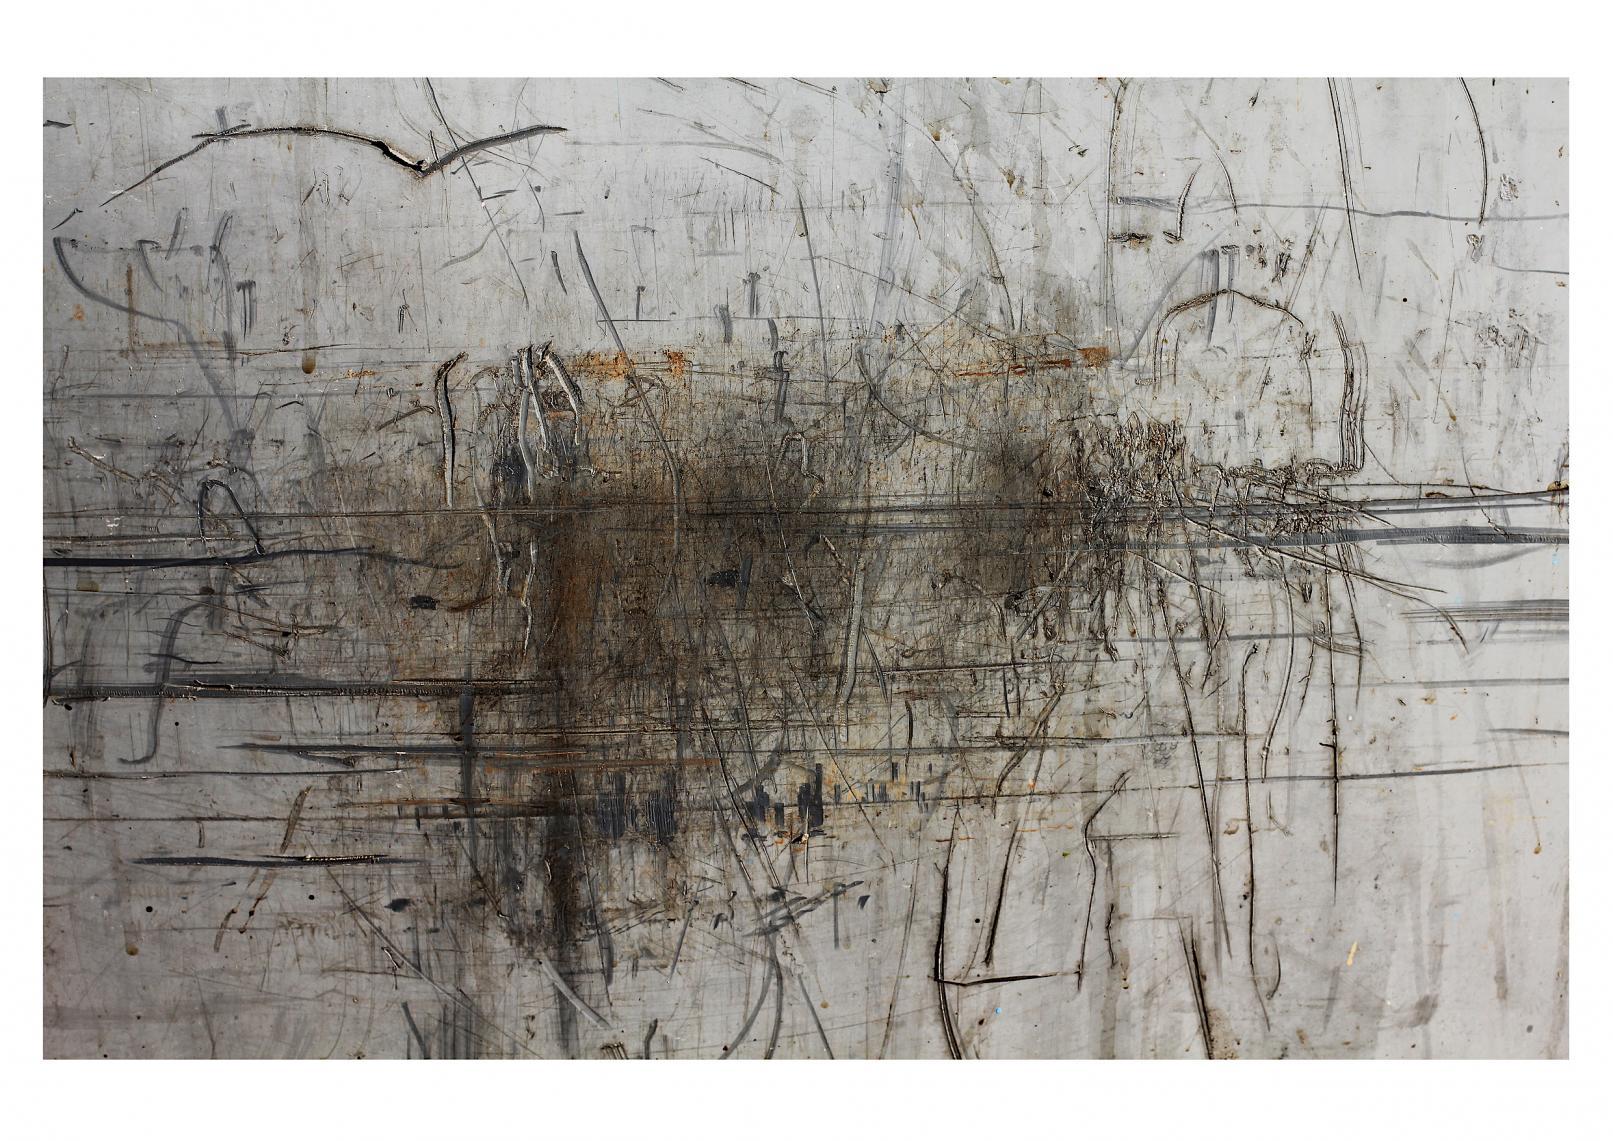 Vedado-Havana (Trash Painting IV) (2017) - David Beltrán